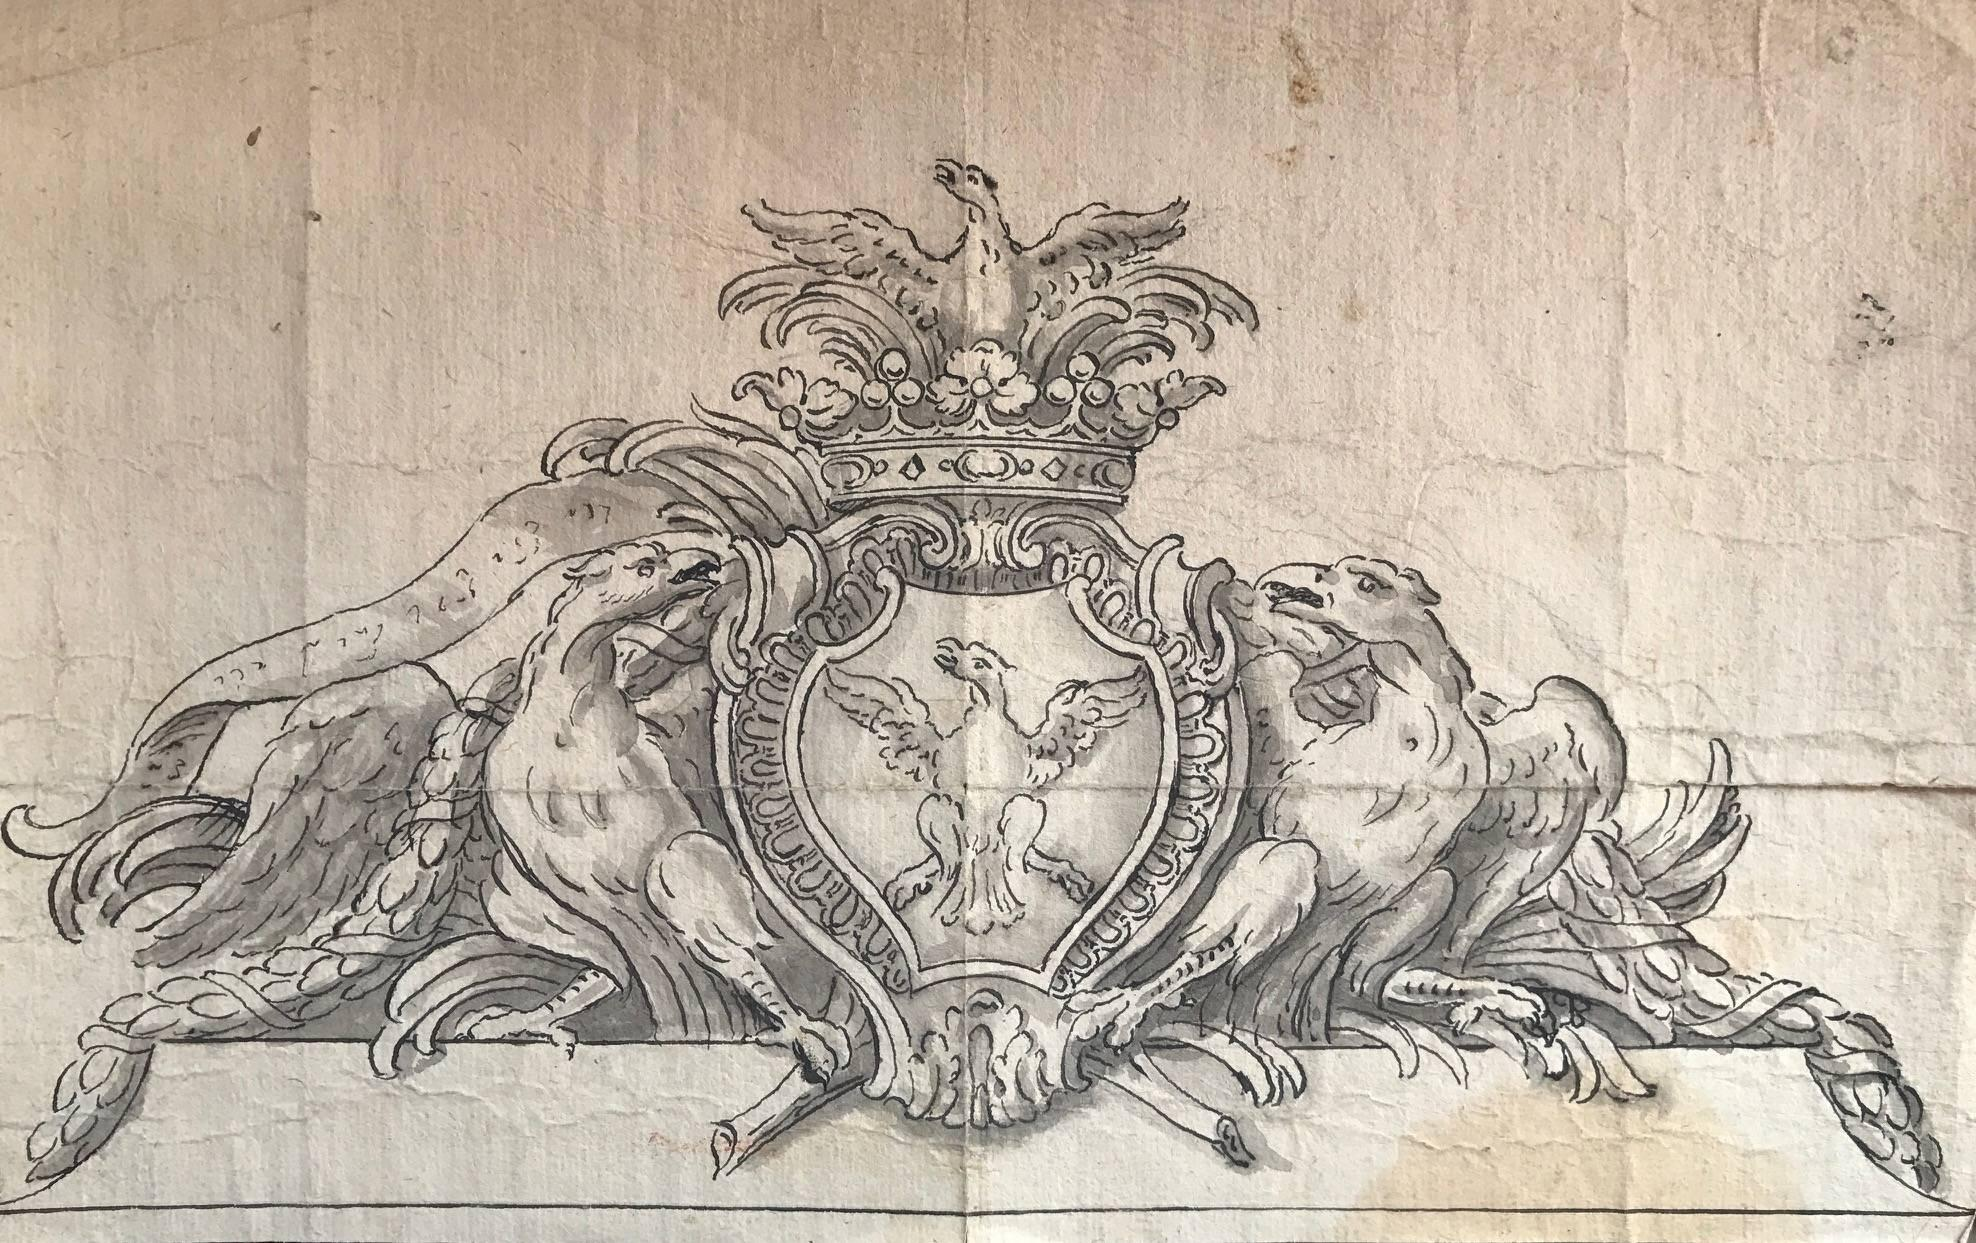 Old Master Drawing - Heraldic Crest Coronet & Shield